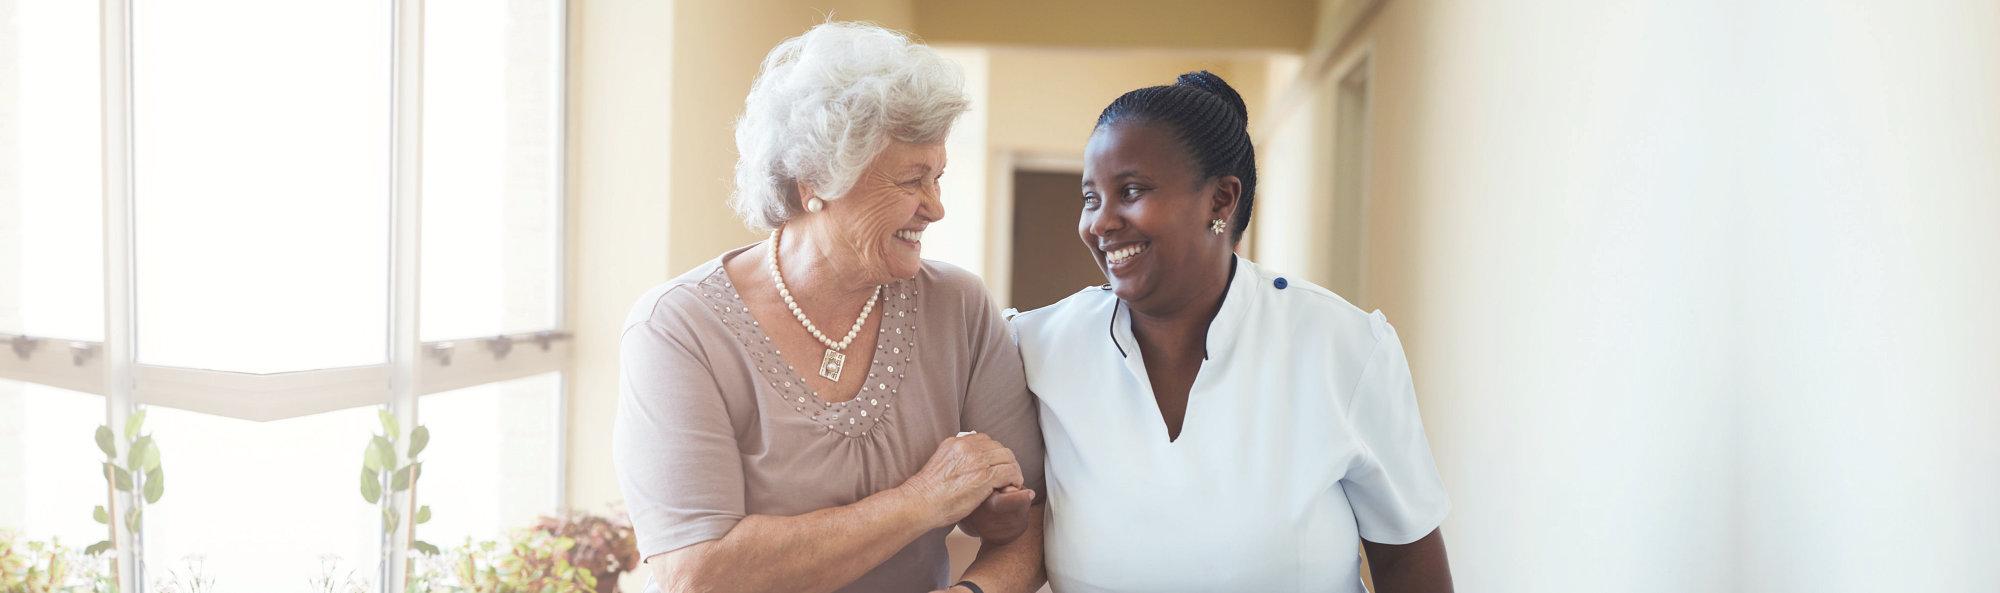 Elderly and female staff